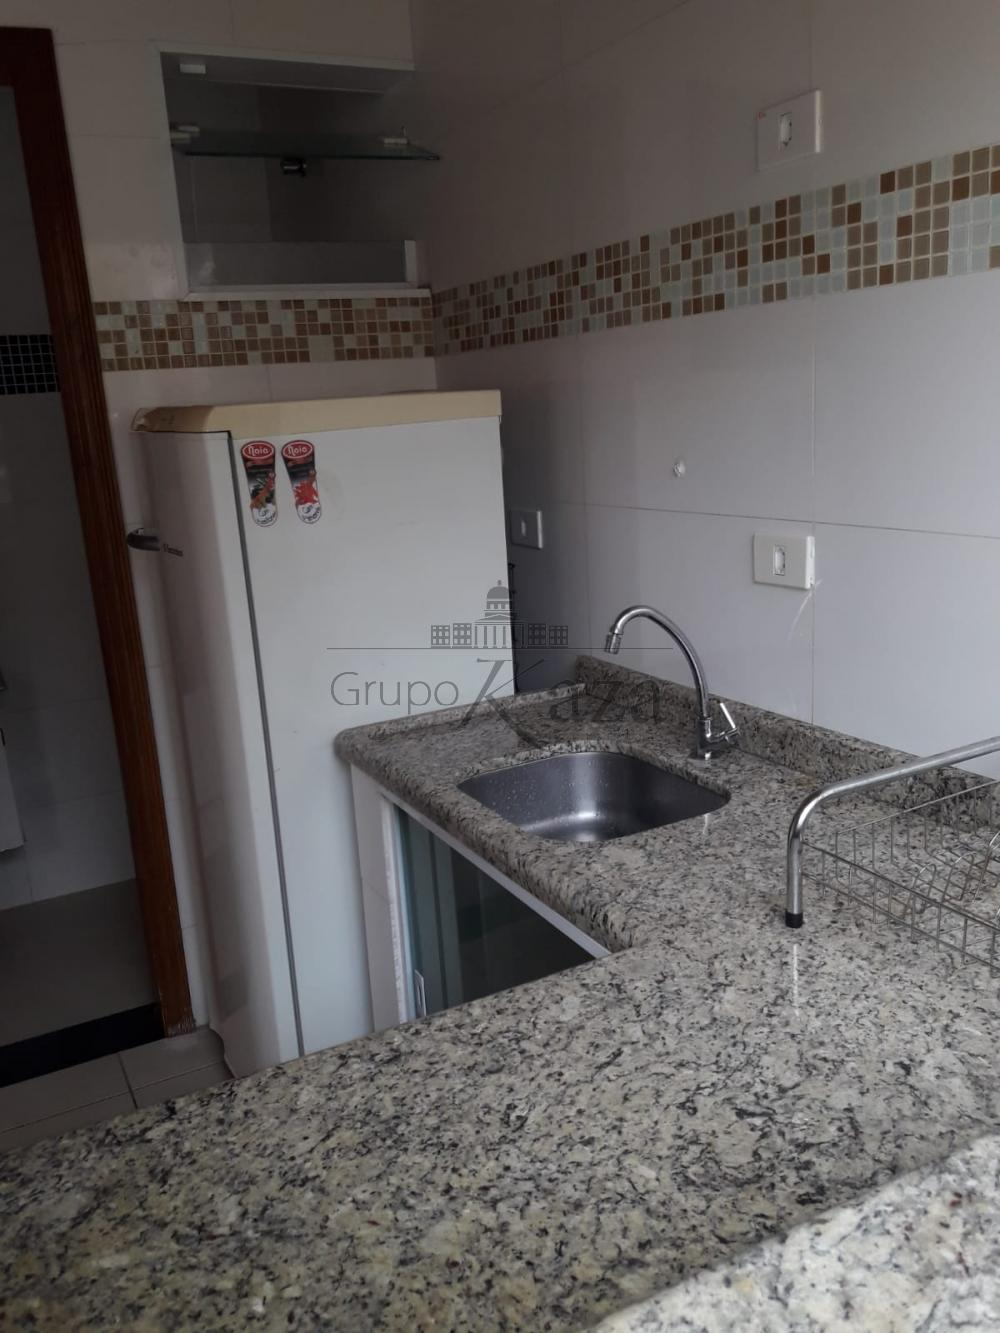 alt='Comprar Casa / Térrea em Jacareí R$ 375.000,00 - Foto 18' title='Comprar Casa / Térrea em Jacareí R$ 375.000,00 - Foto 18'